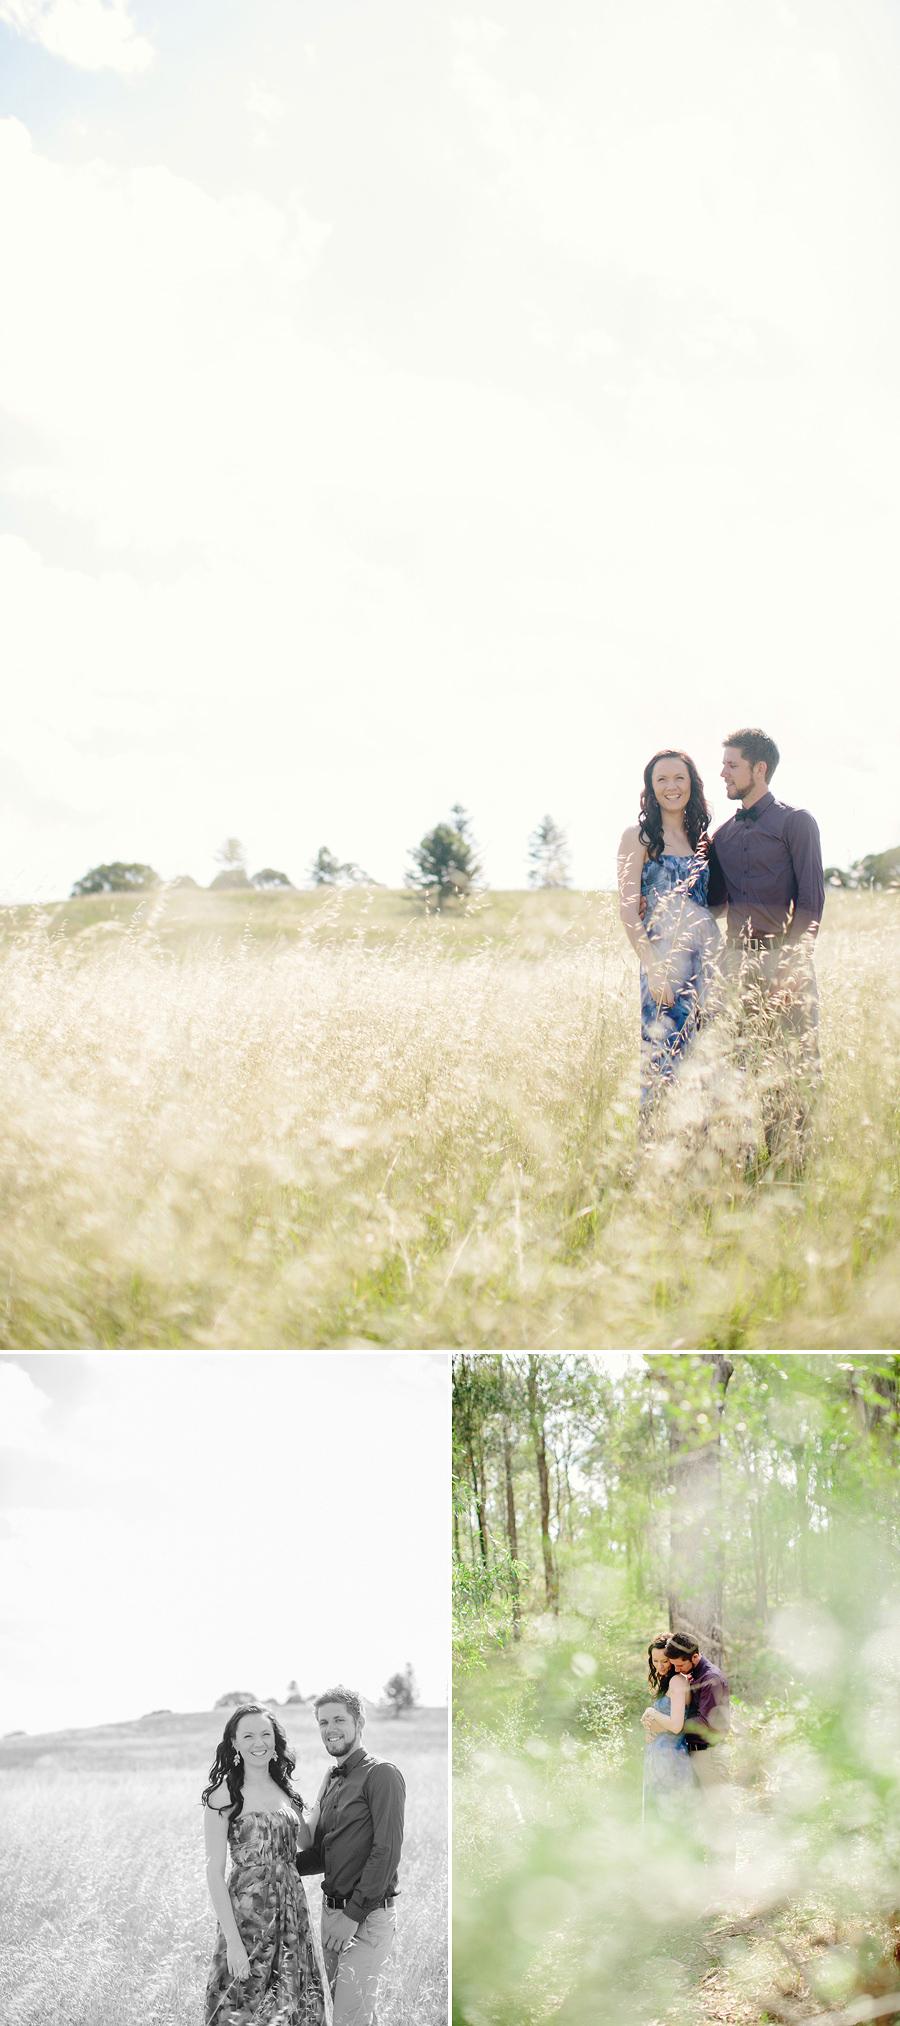 Sydney Engagement Photography: Kelsi & Chris